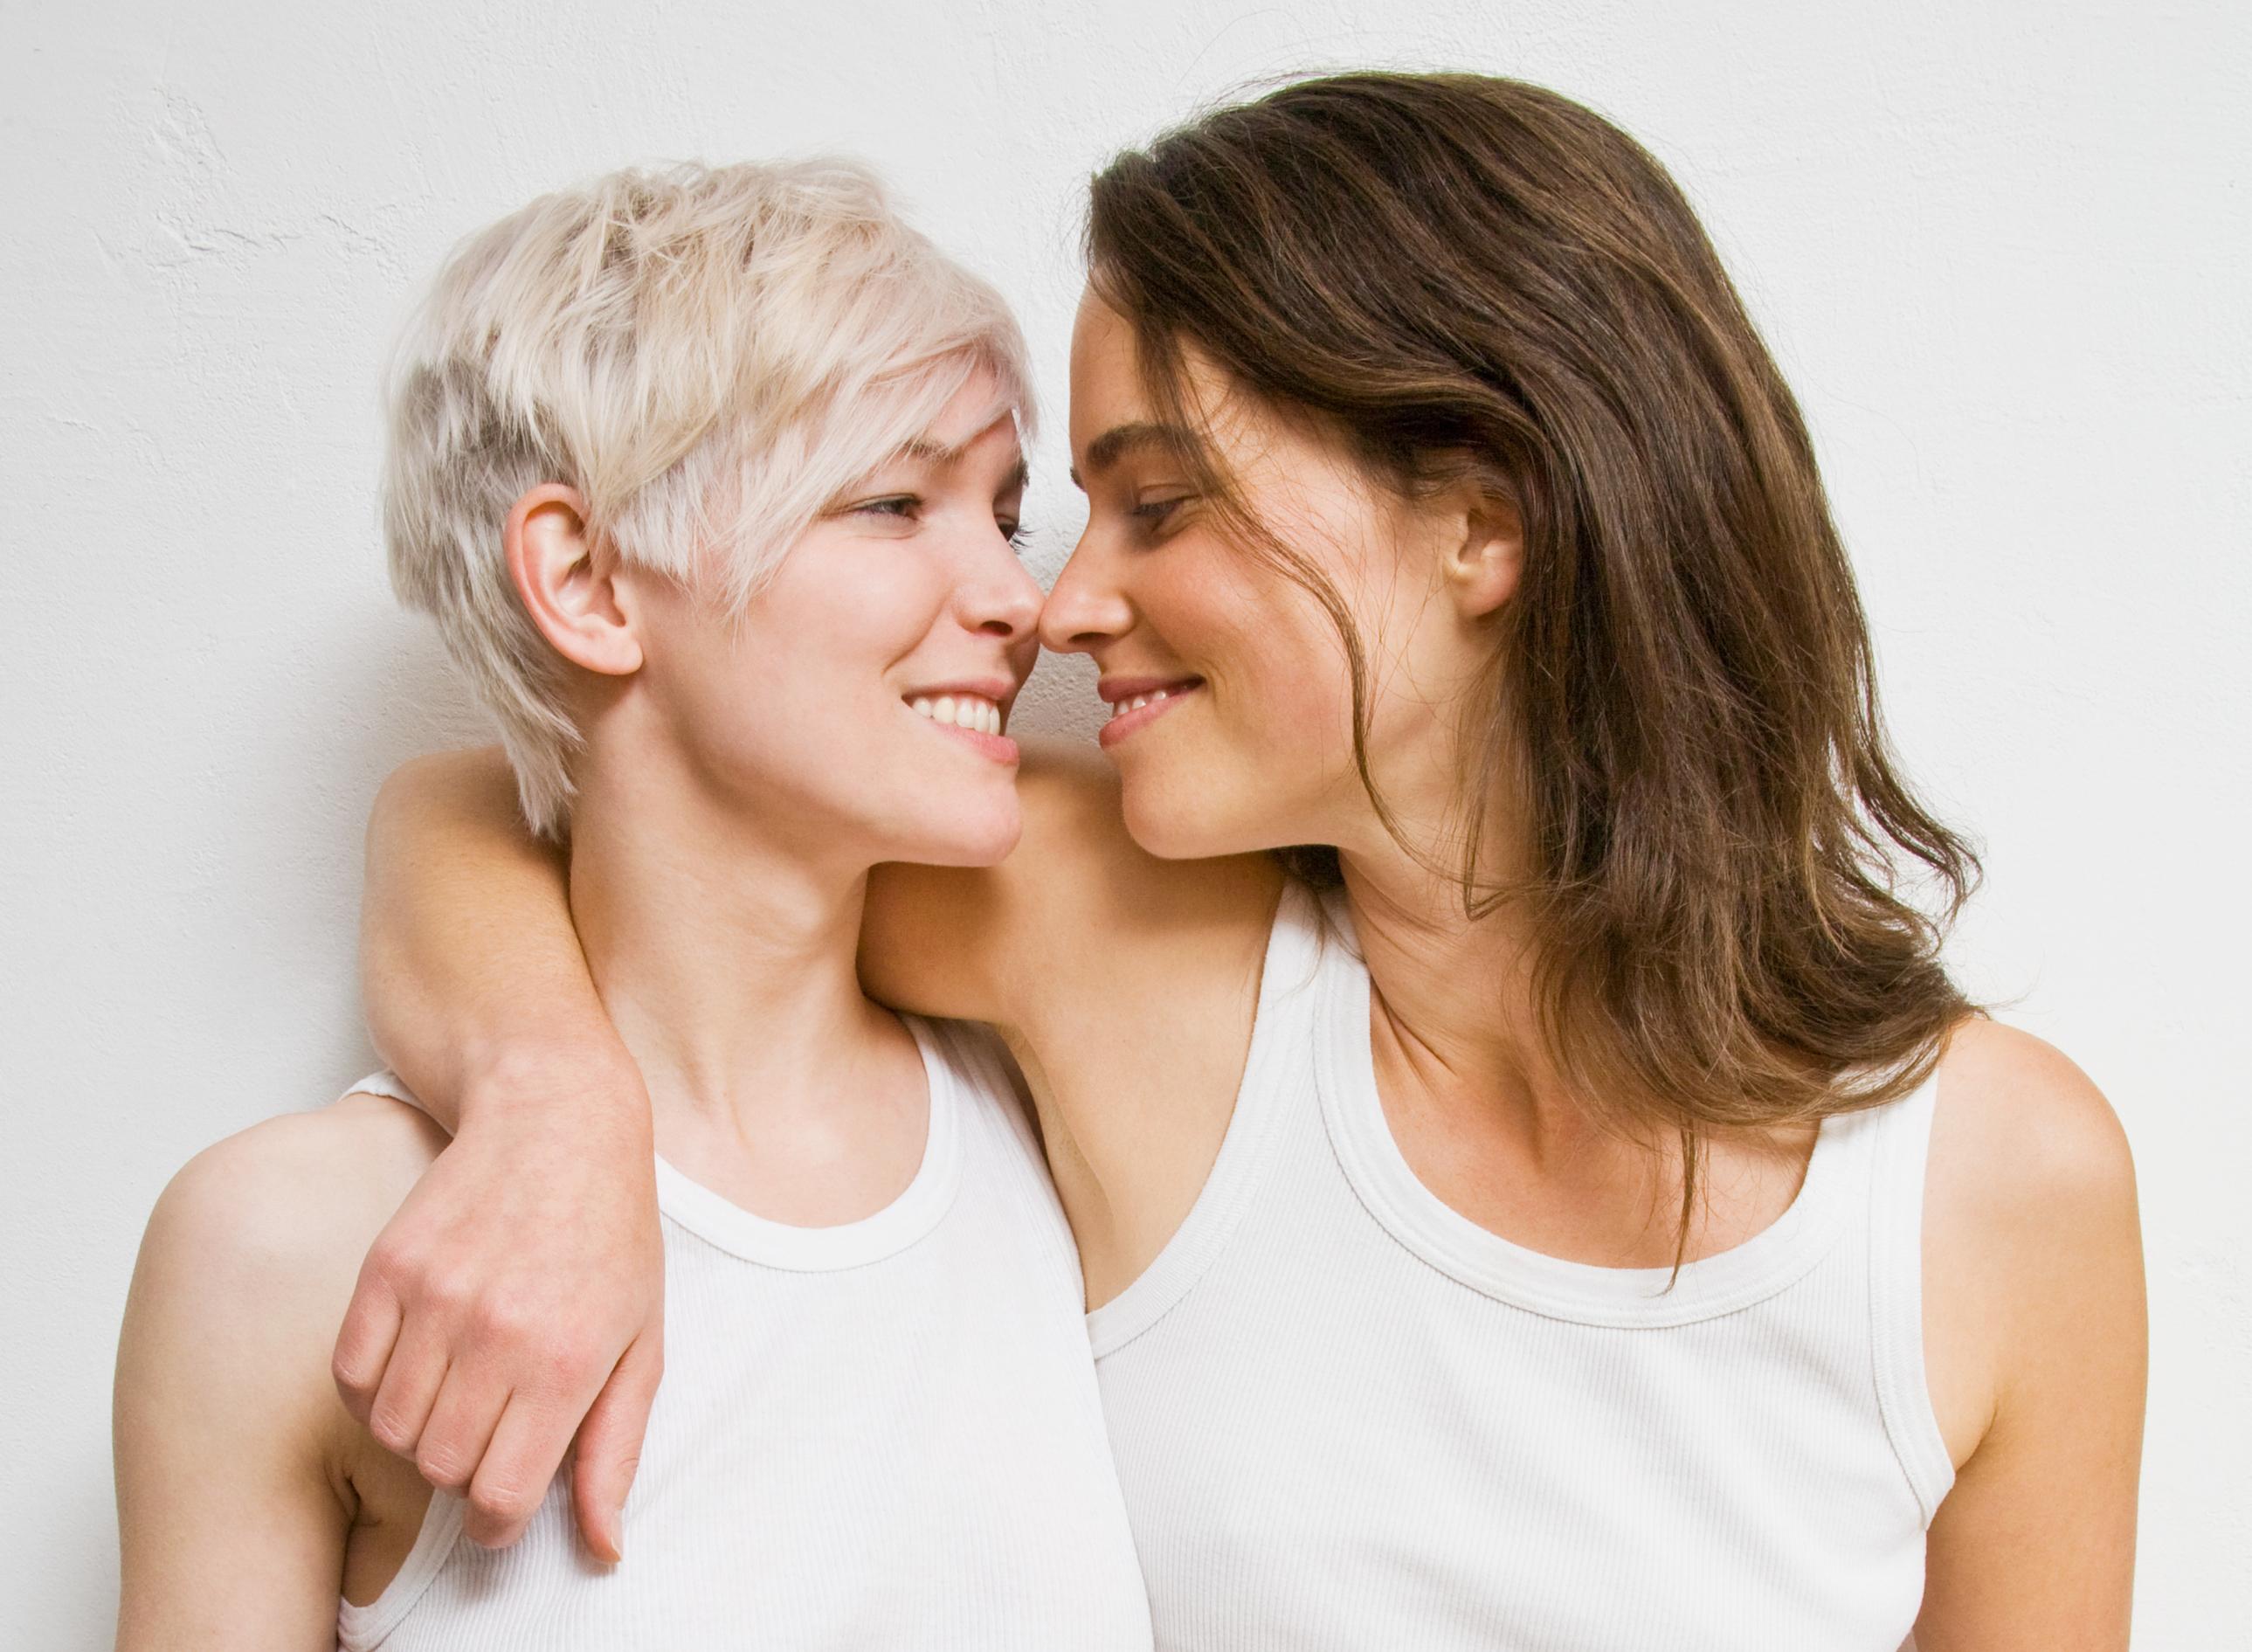 free women dating site